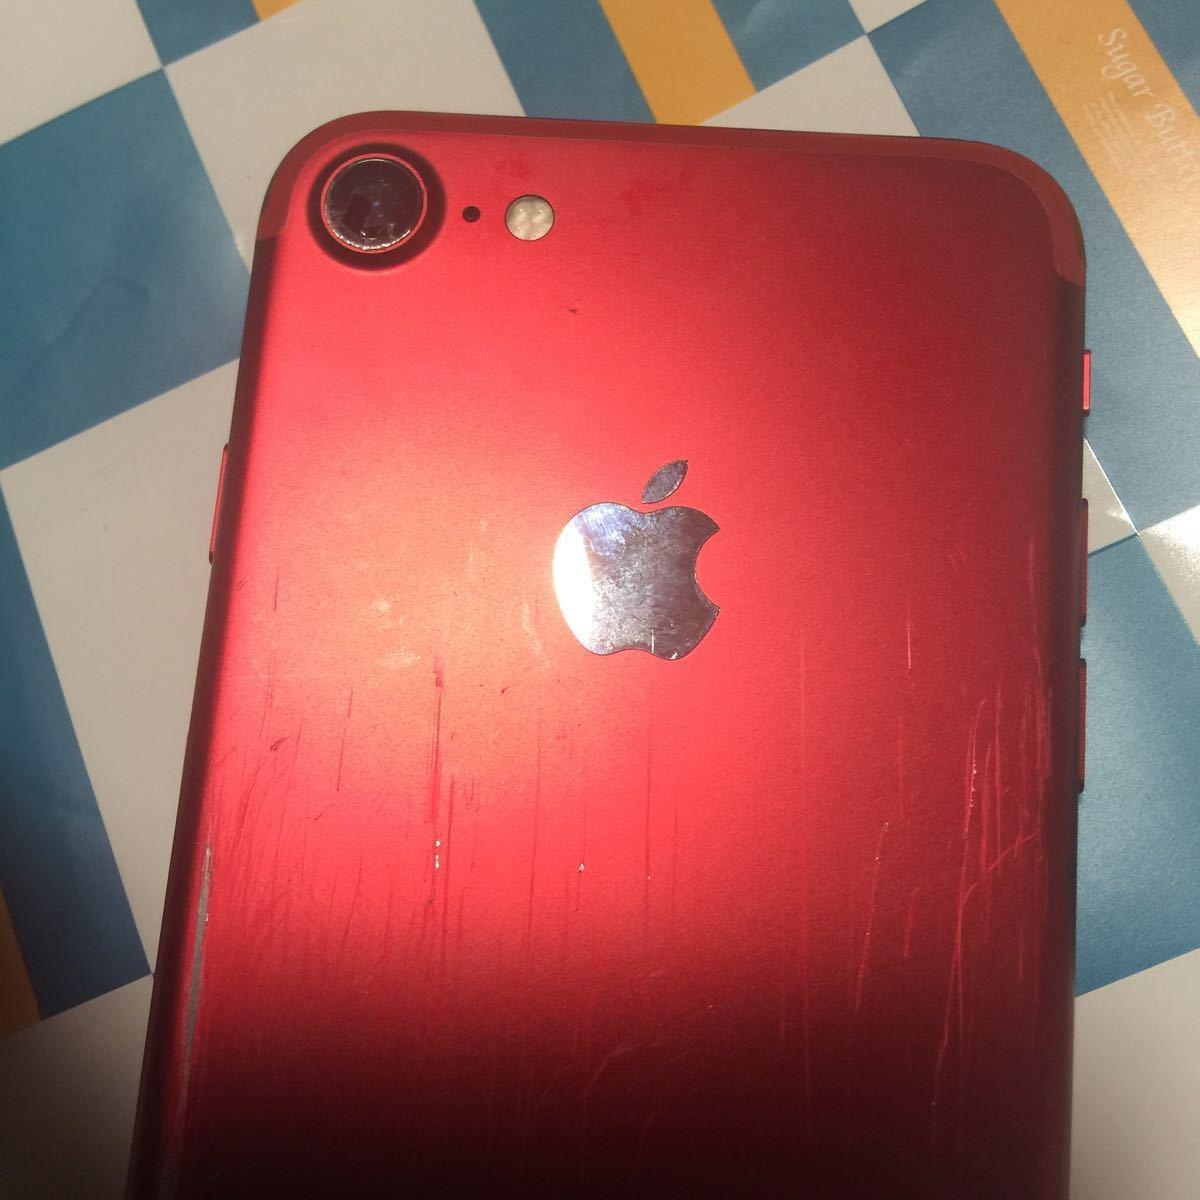 au iPhone 7 128GB (PRODUCT) レッド 本体 携帯 中古 スマホ apple アップル[ ジャンク] 送料無料。 全体 全体的に状態が悪い。_画像3